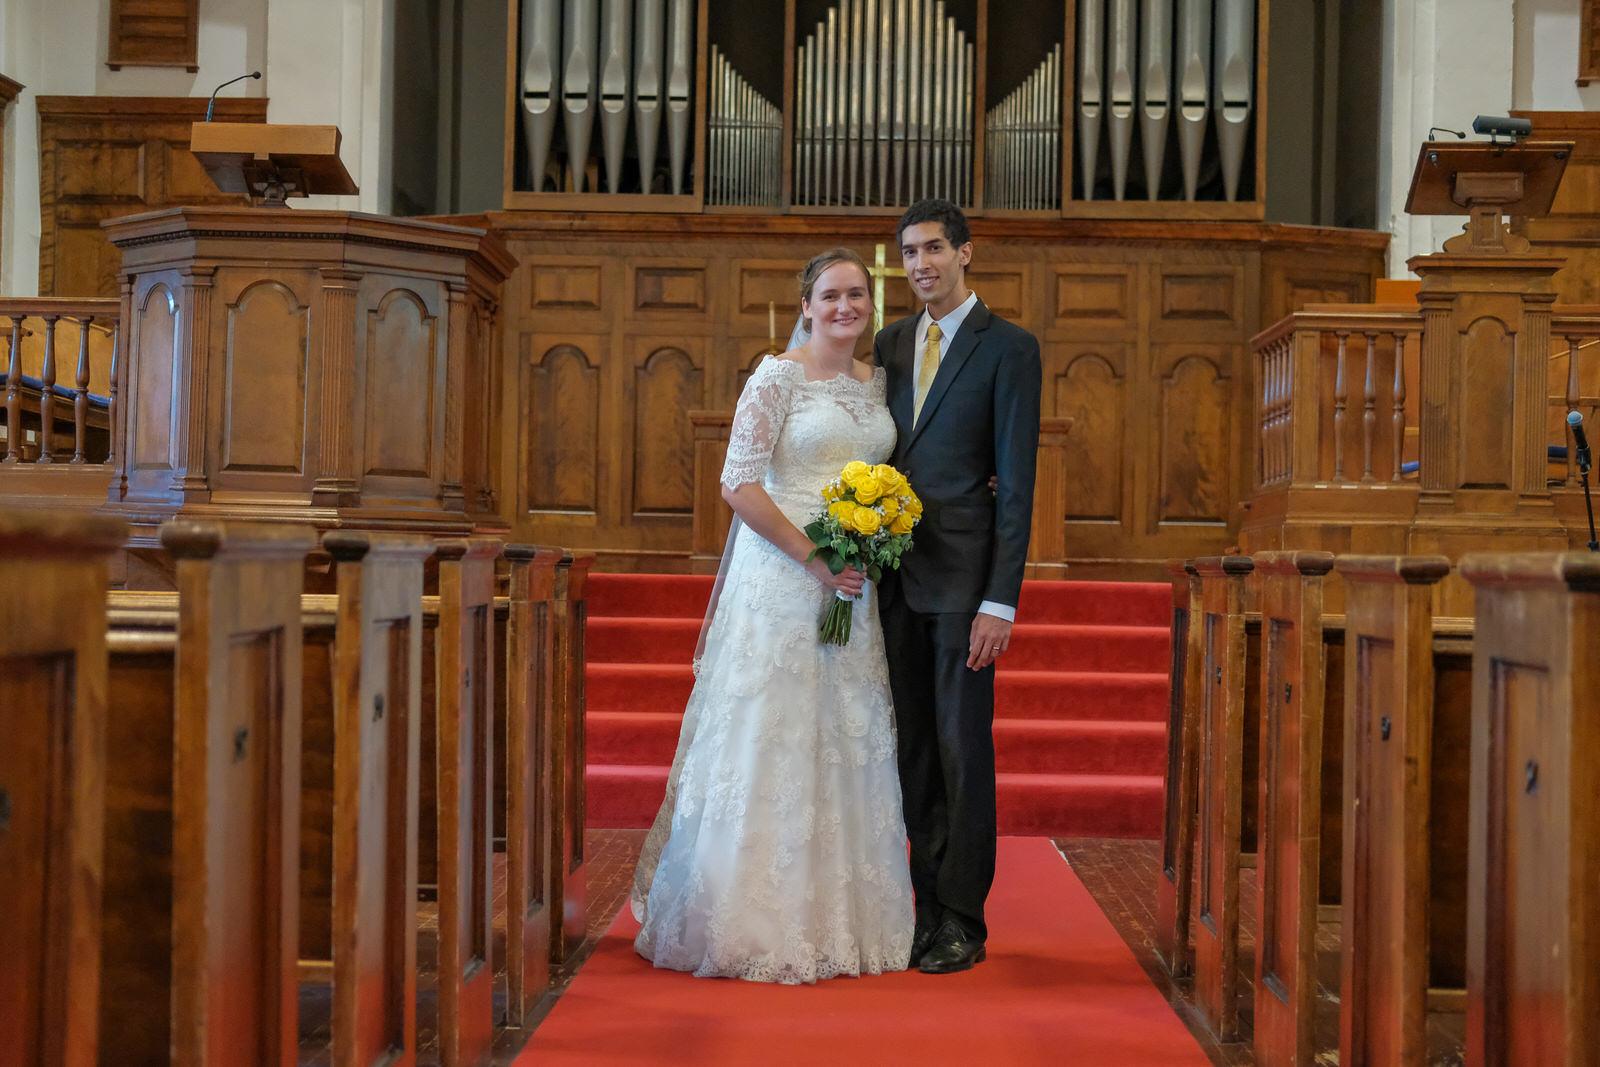 candid-vermont-wedding-photography-889.jpg